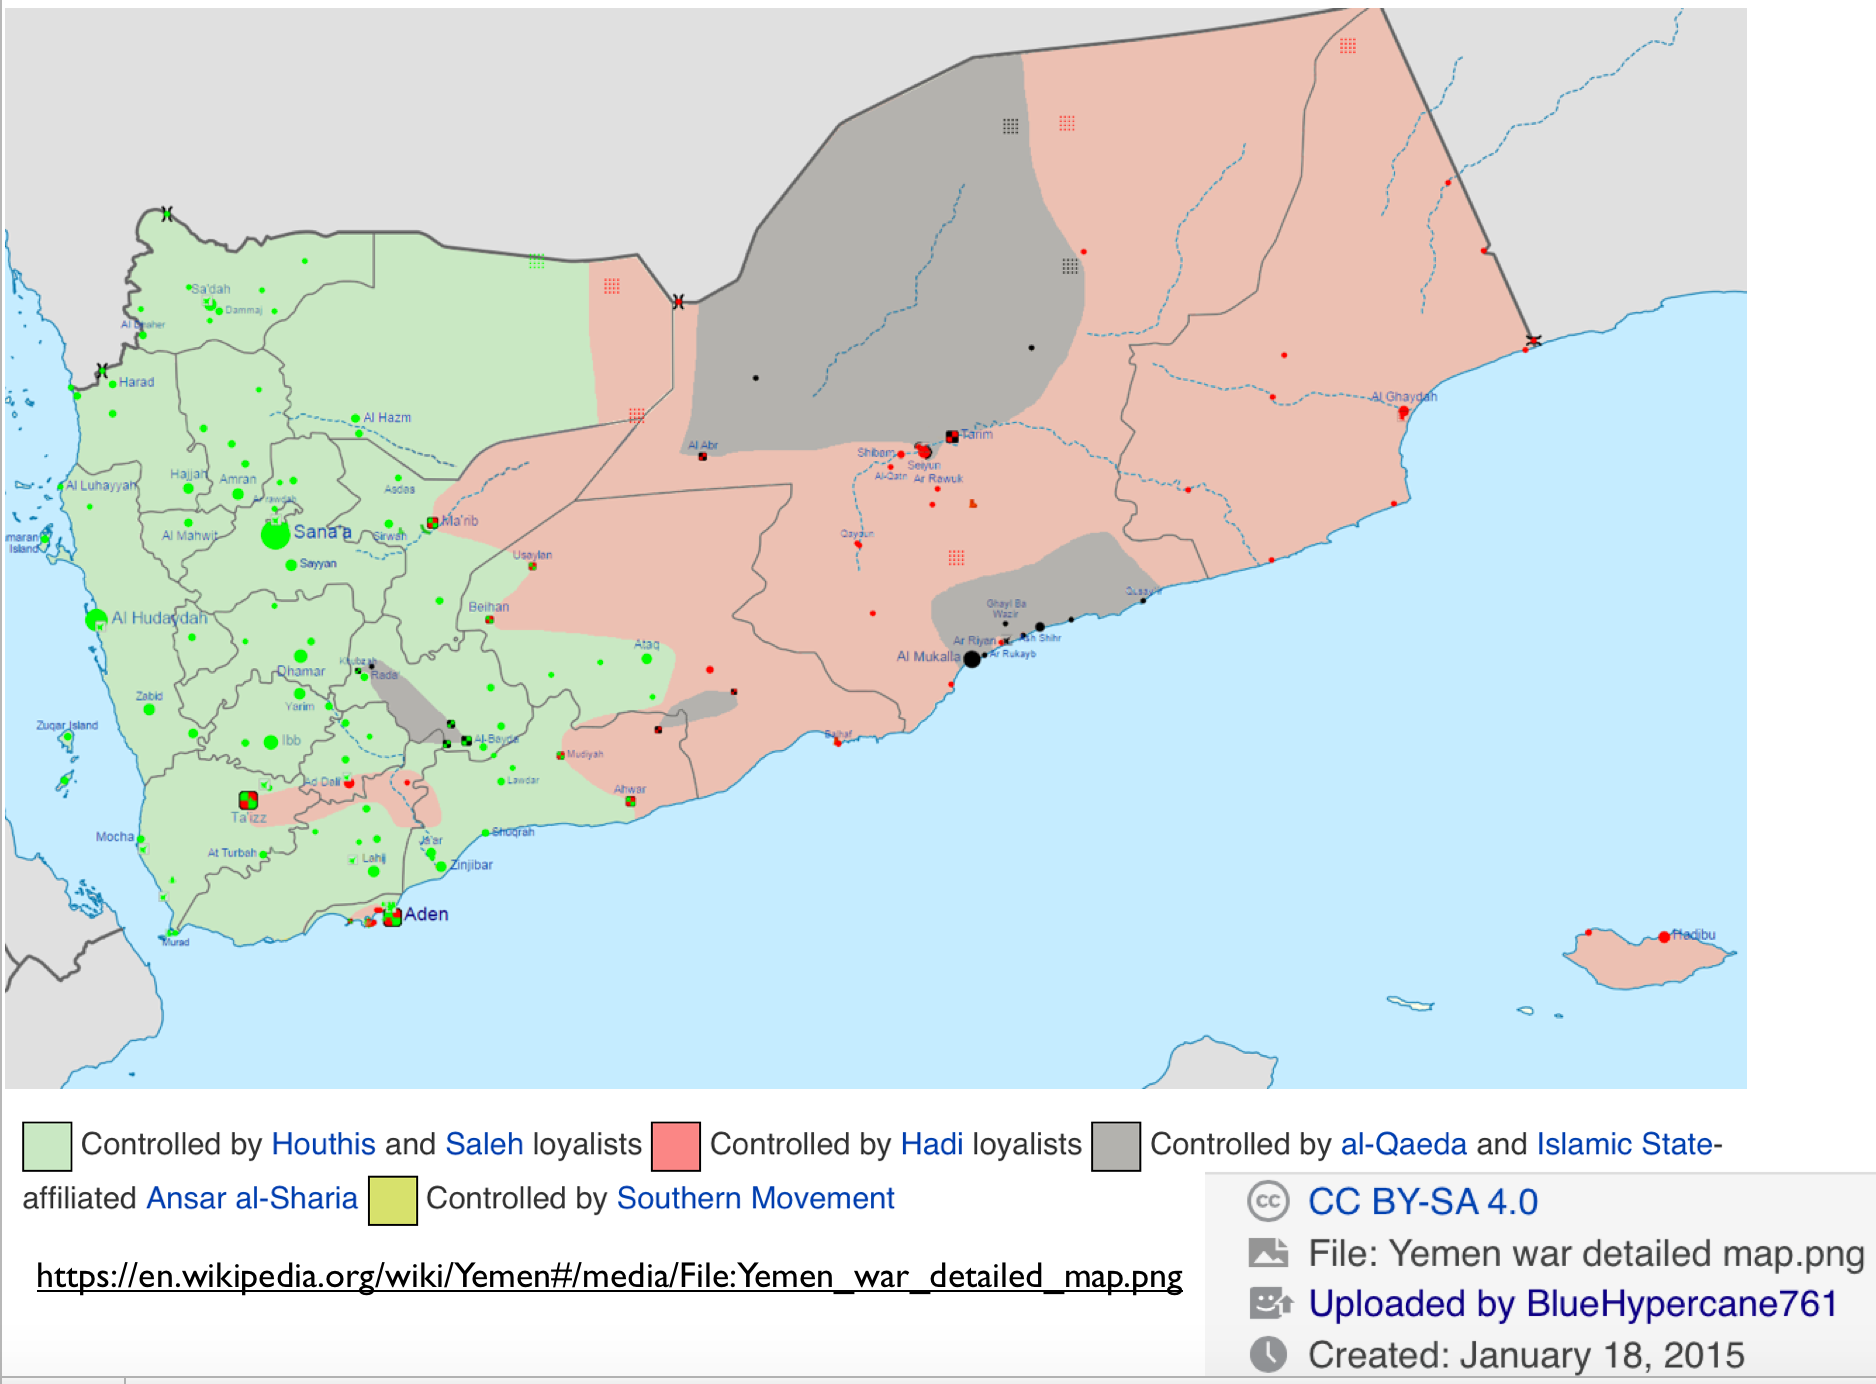 Yemens Beleaguered Al Mahrah Seeks Autonomy GeoCurrents